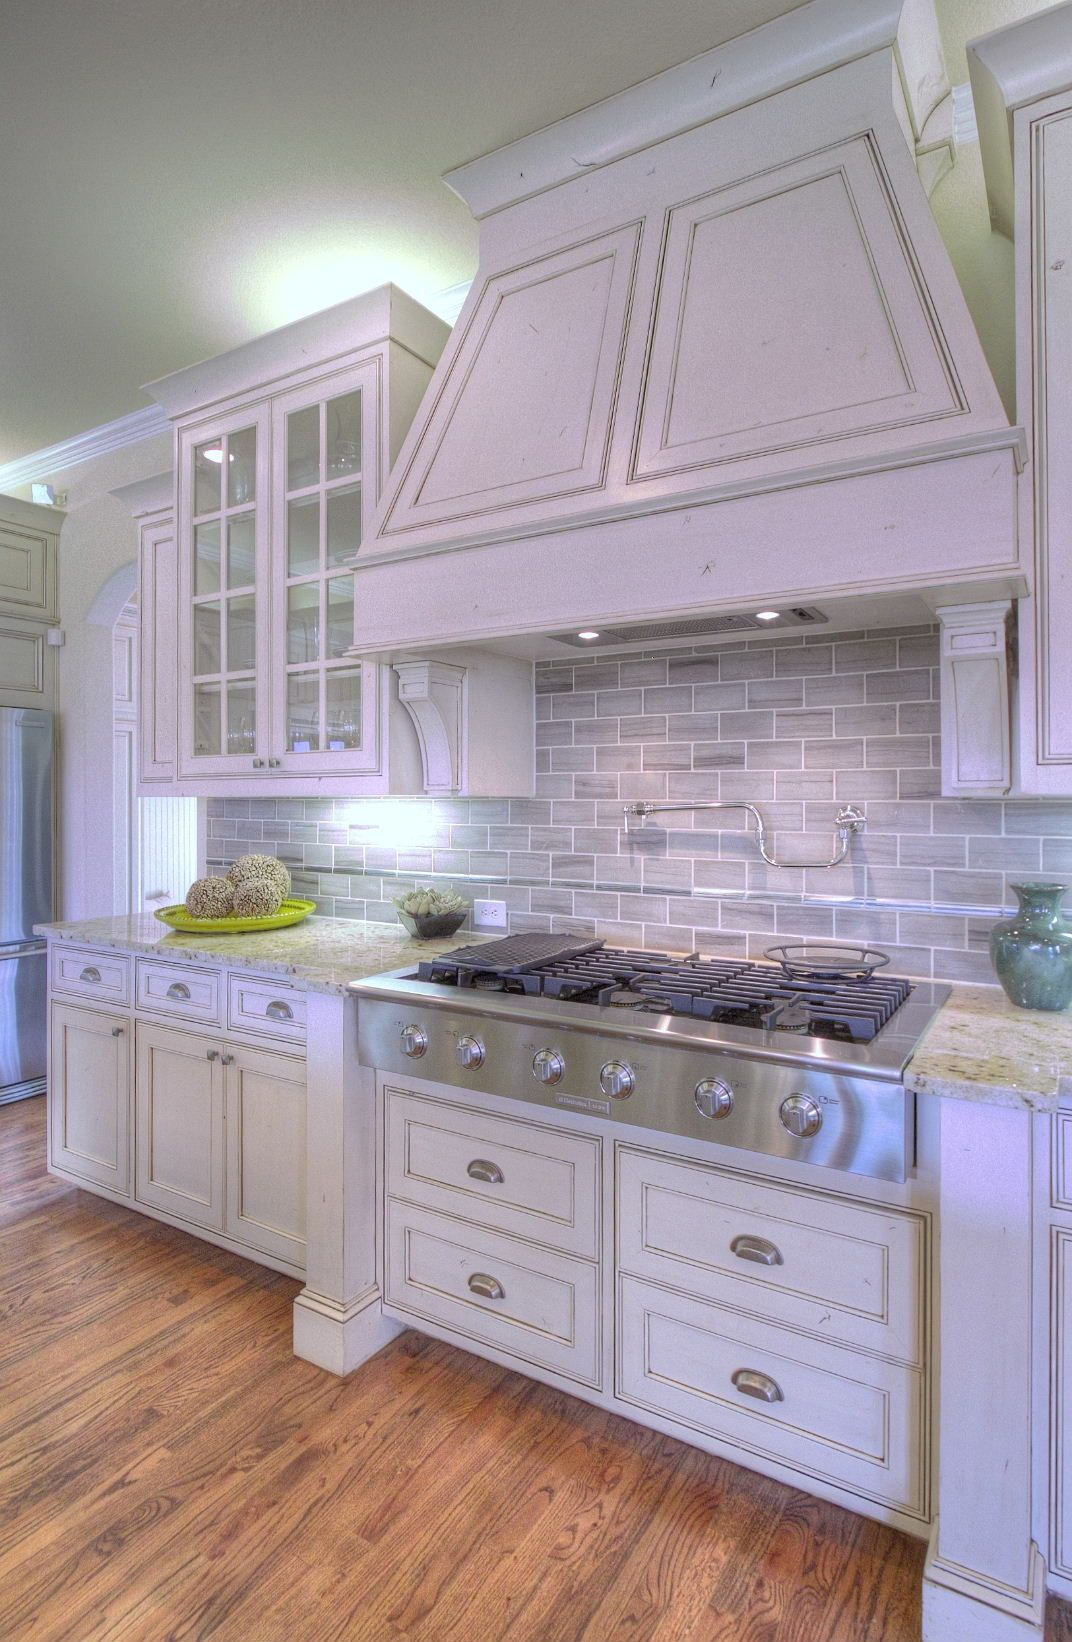 Choosing kitchen backsplash design for a dream kitchen kitchen